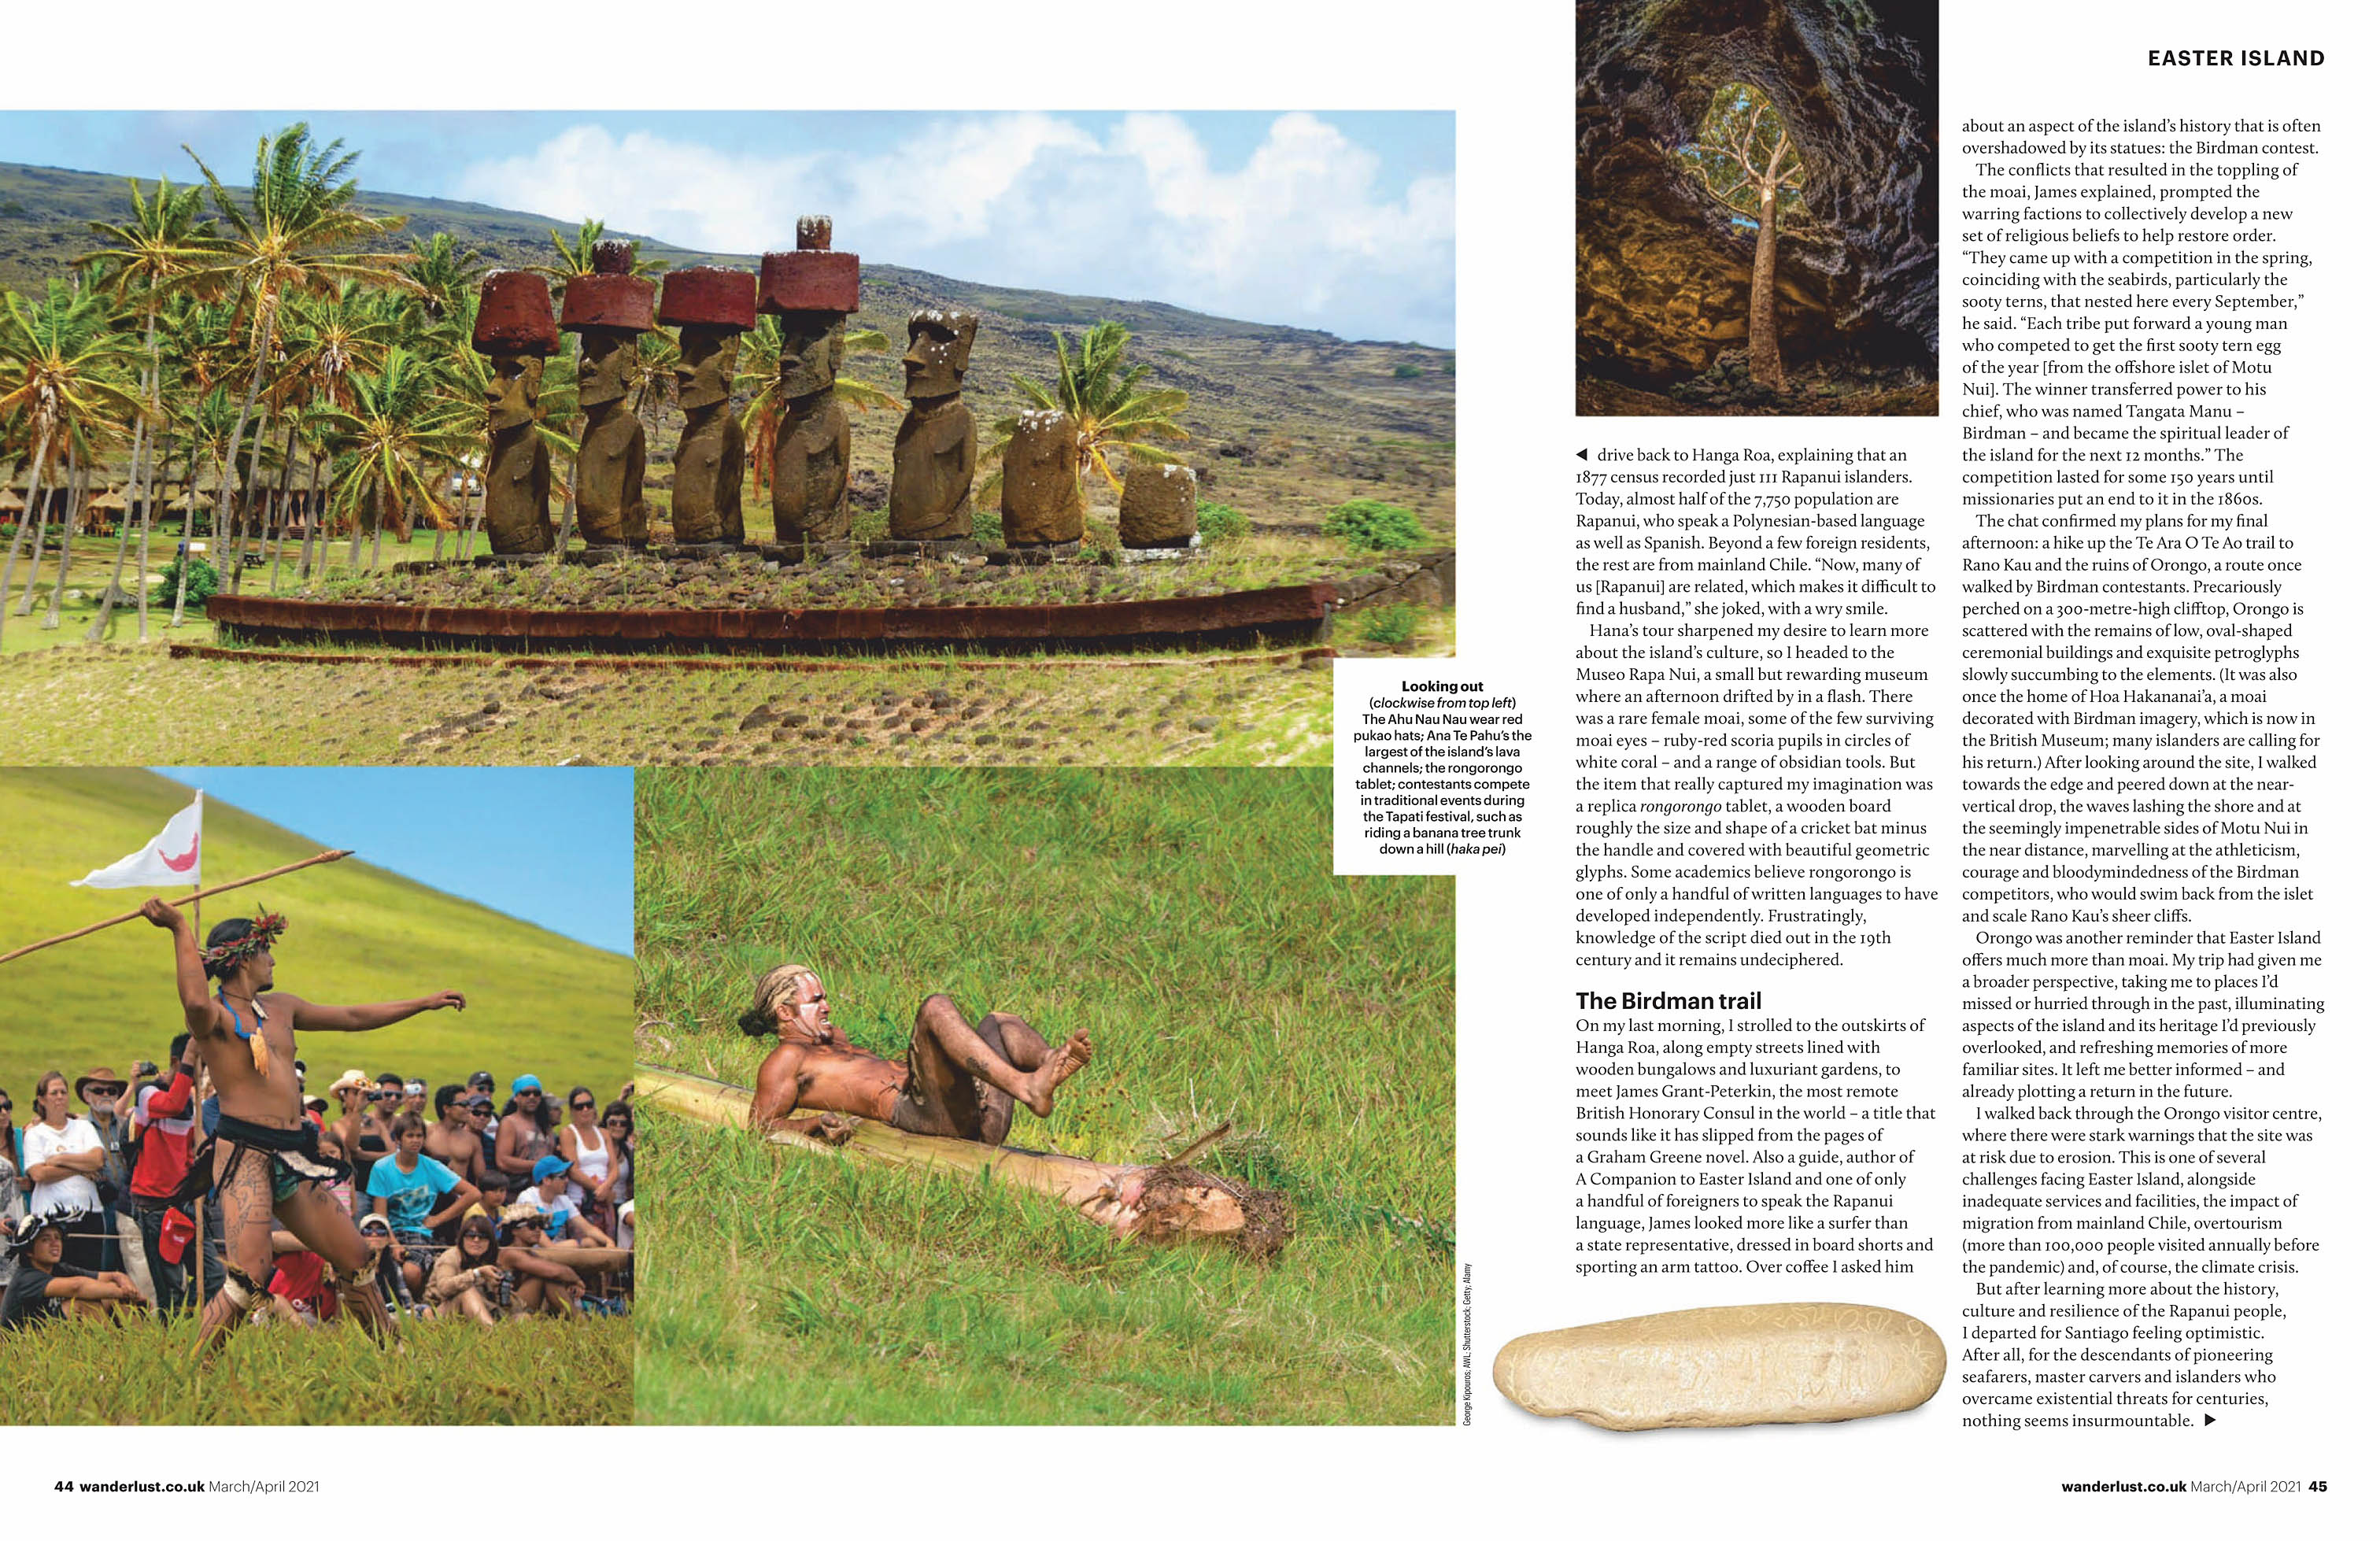 Wanderlust 2021-03-04 Easter Island-6.jpg